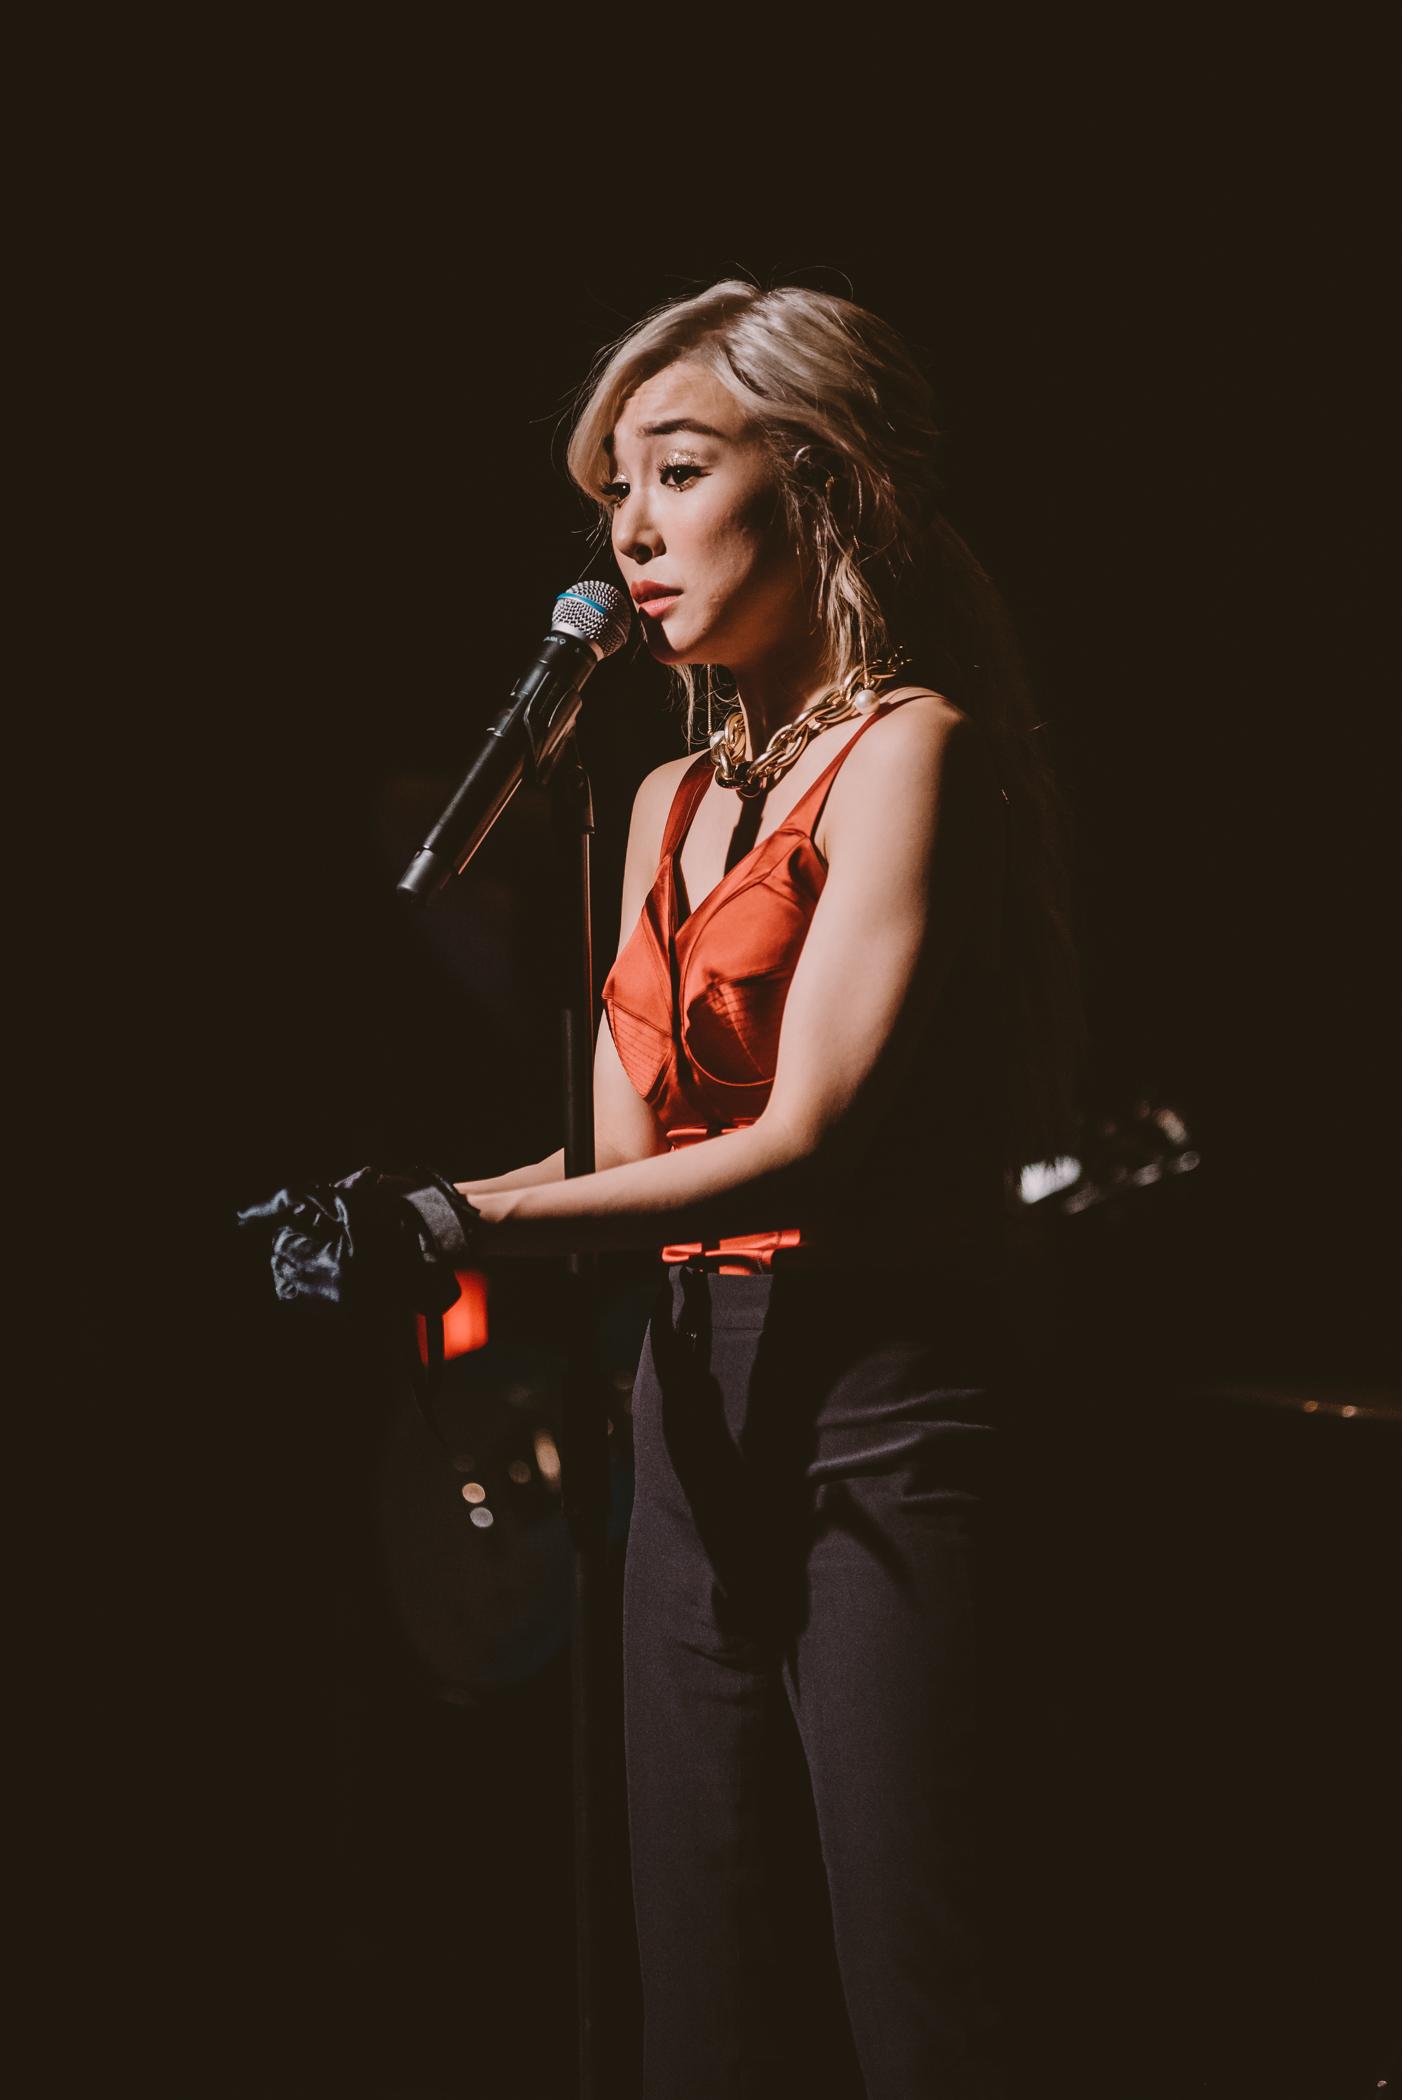 Tiffany_Young-Timothy_Nguyen-20190313 (55 of 83).JPG